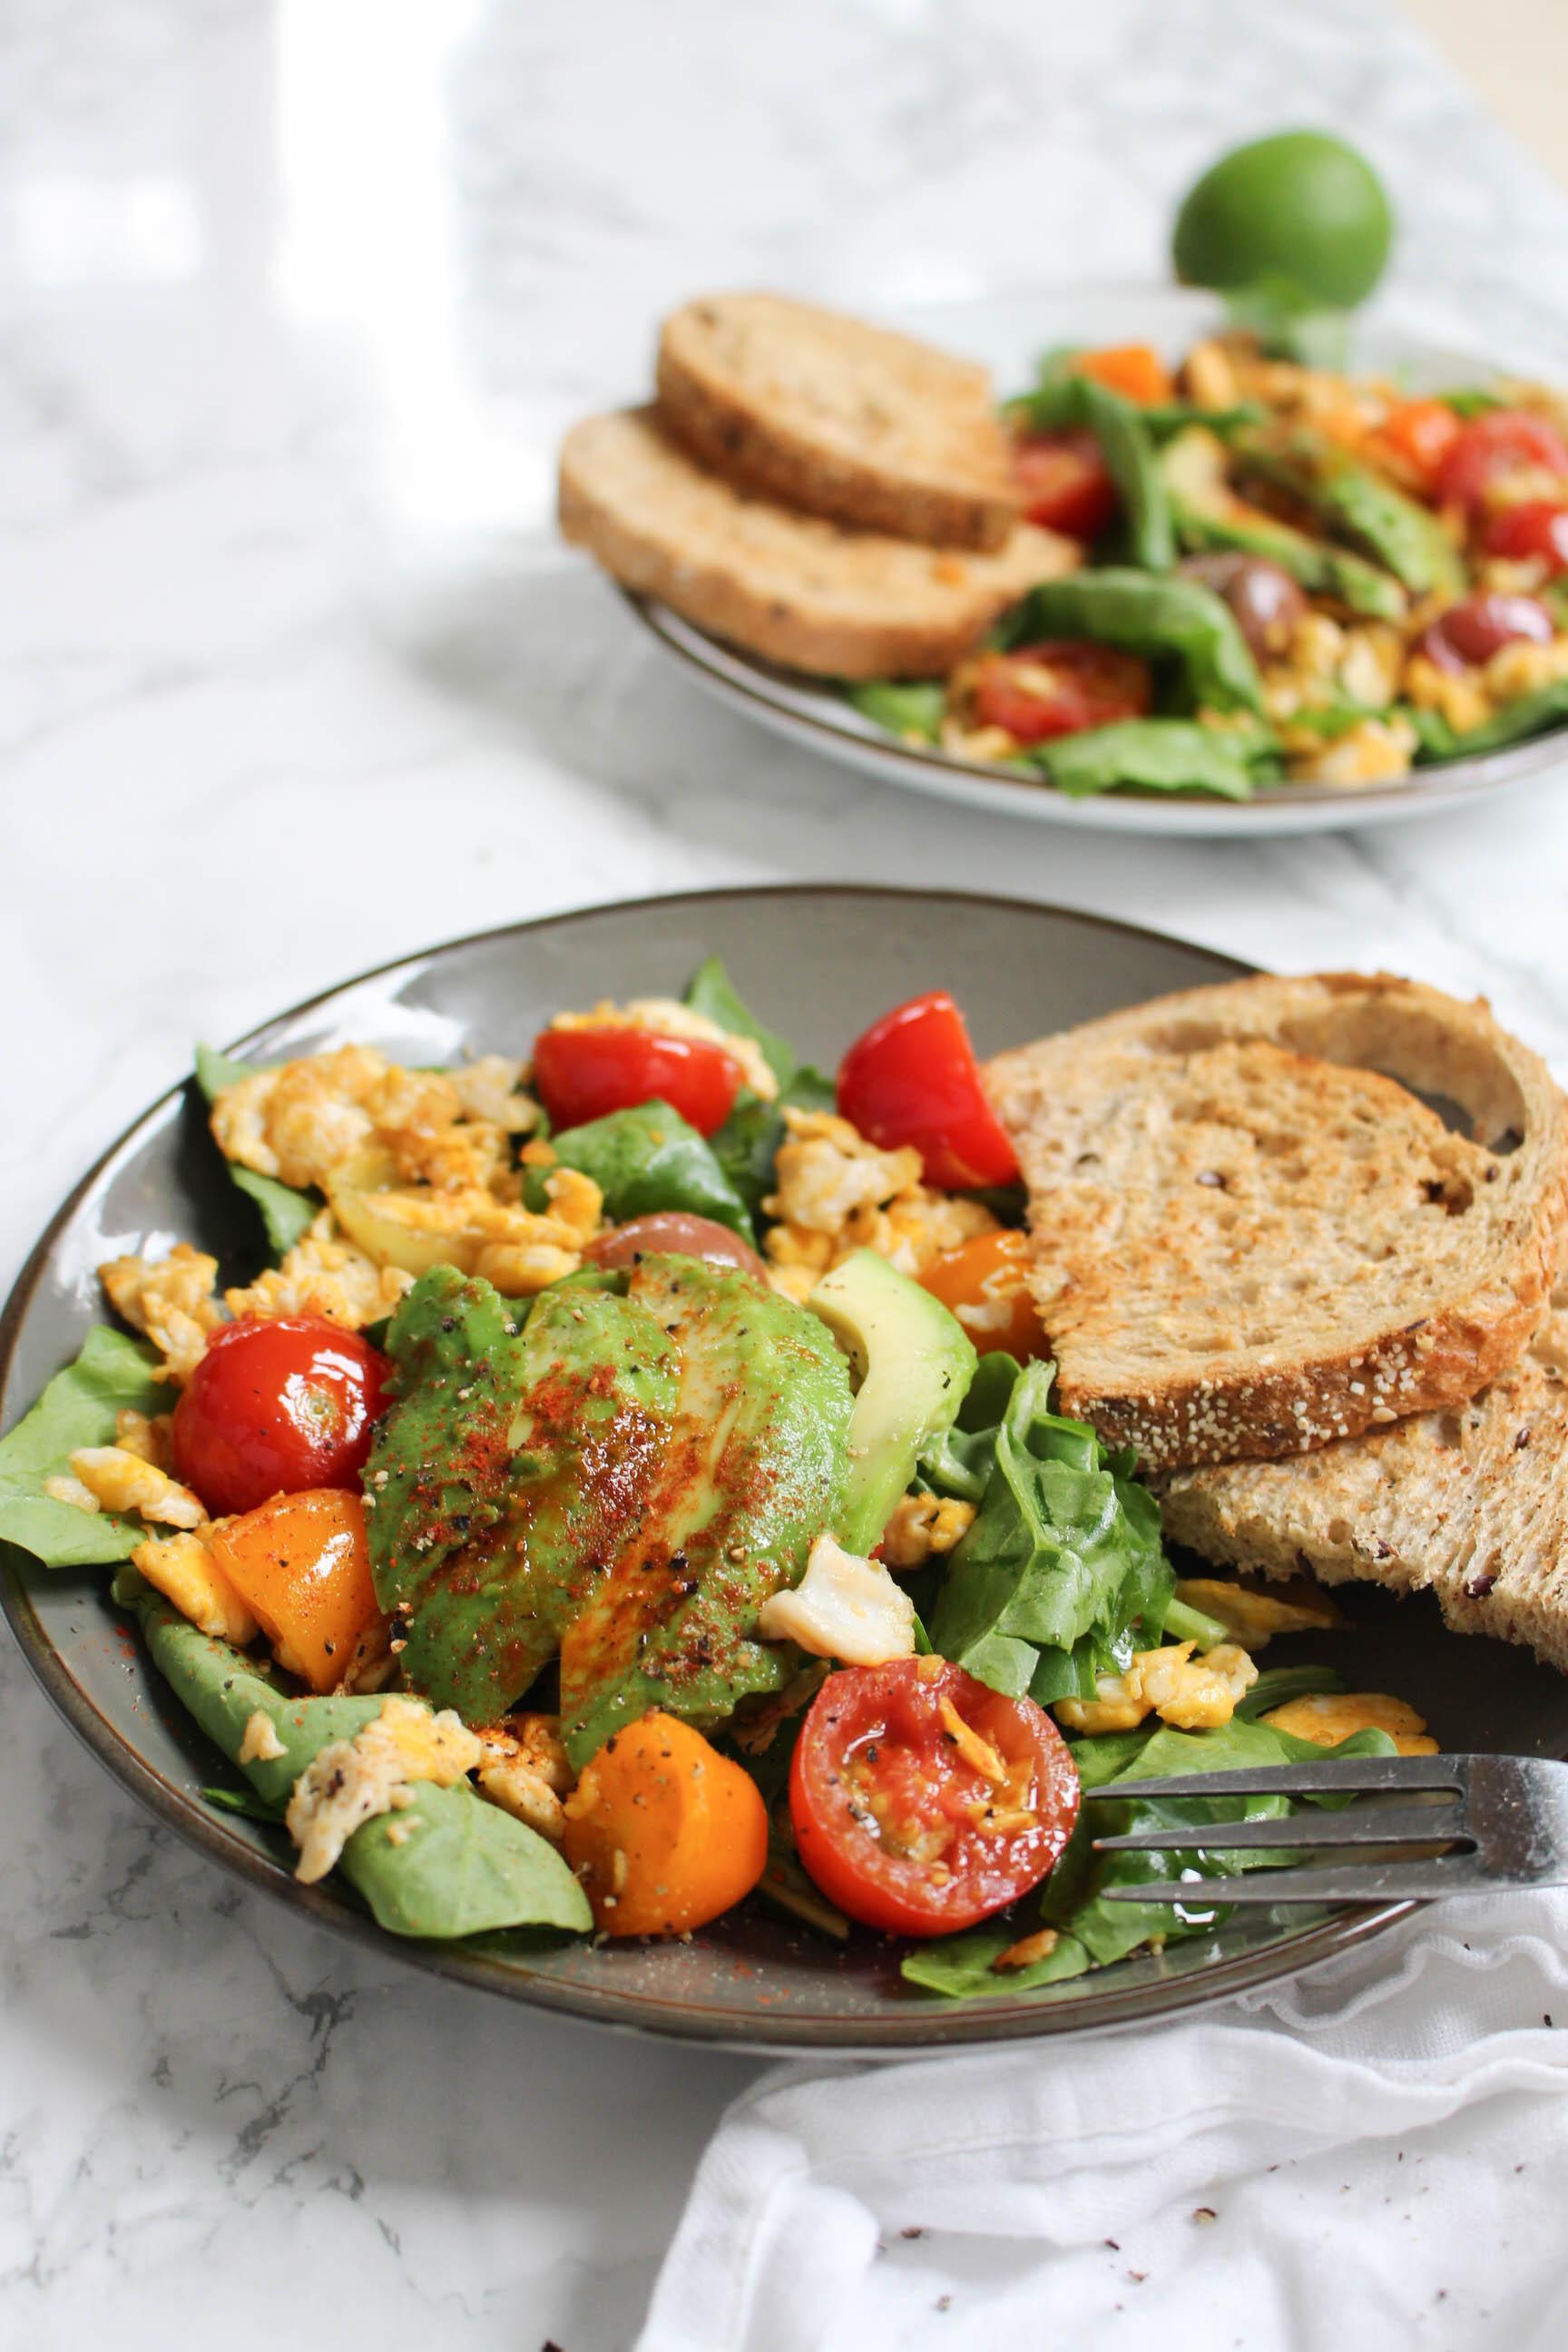 toast spinazie, ei en avocado